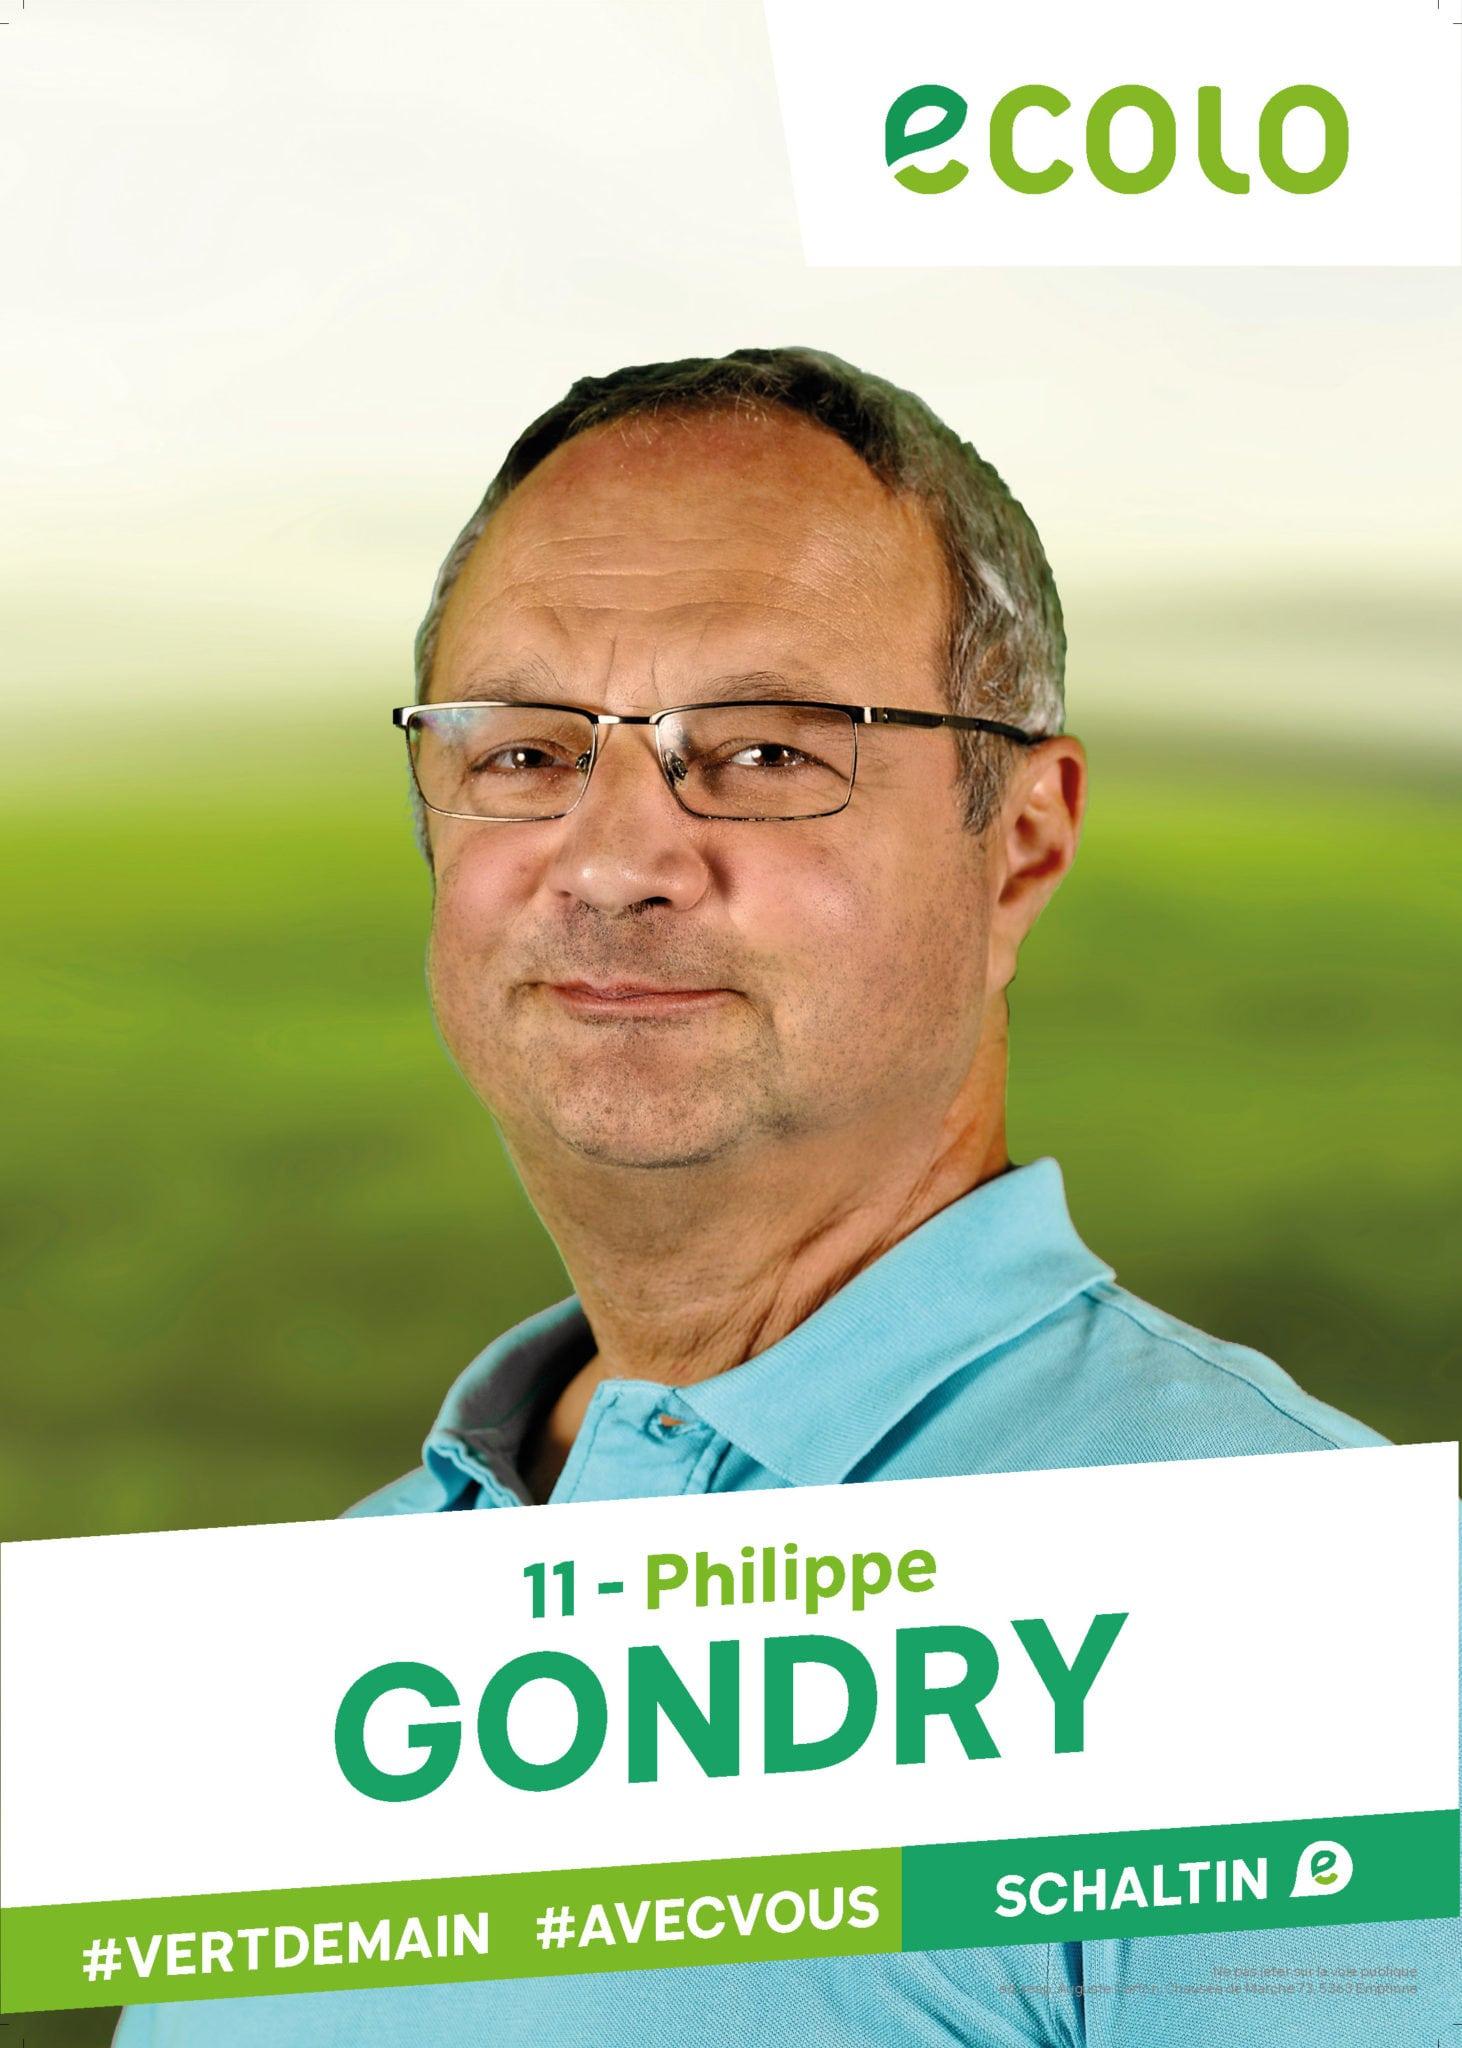 11 - Philippe GONDRY